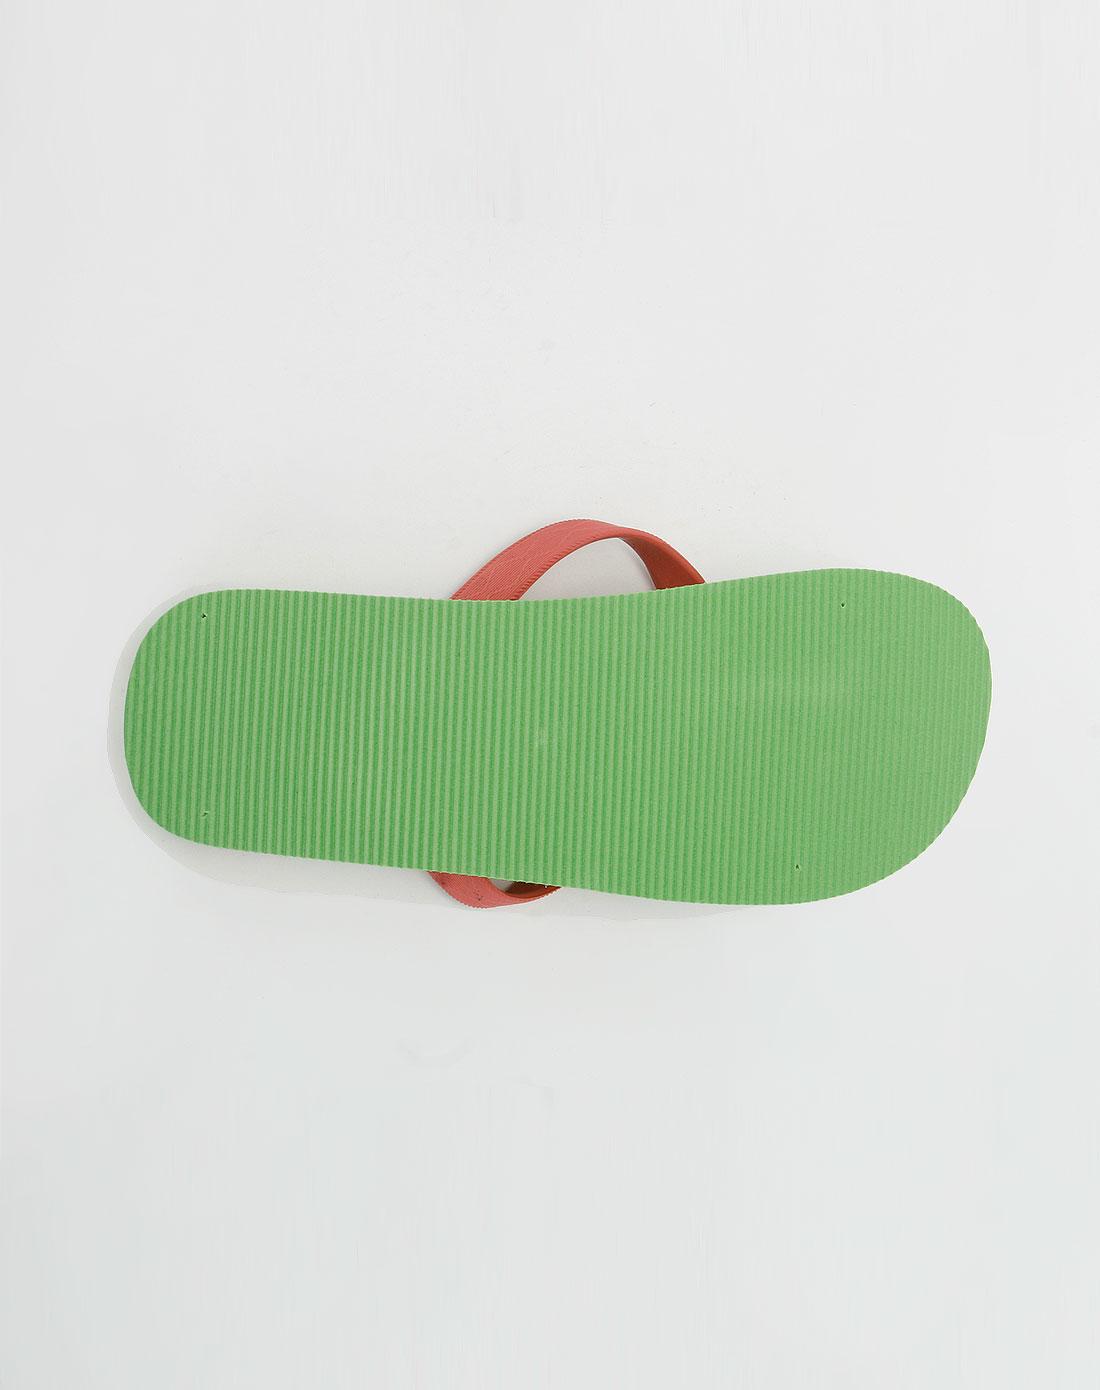 fox-女款浅绿色沙滩拖鞋